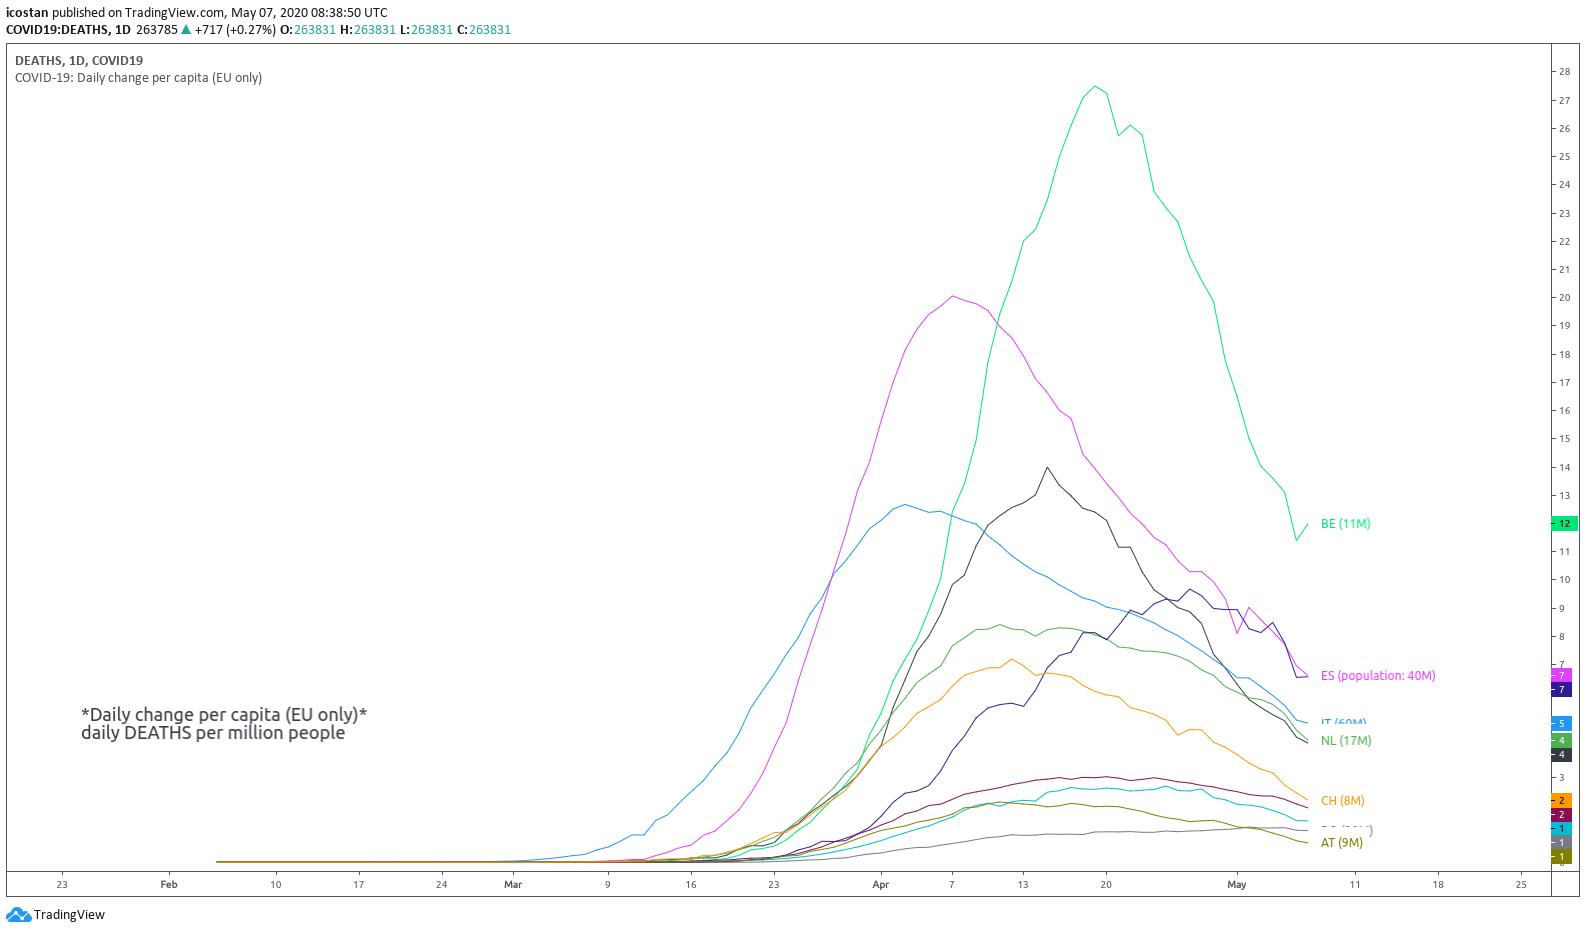 /img/covid19/daily-change-per-capita.png